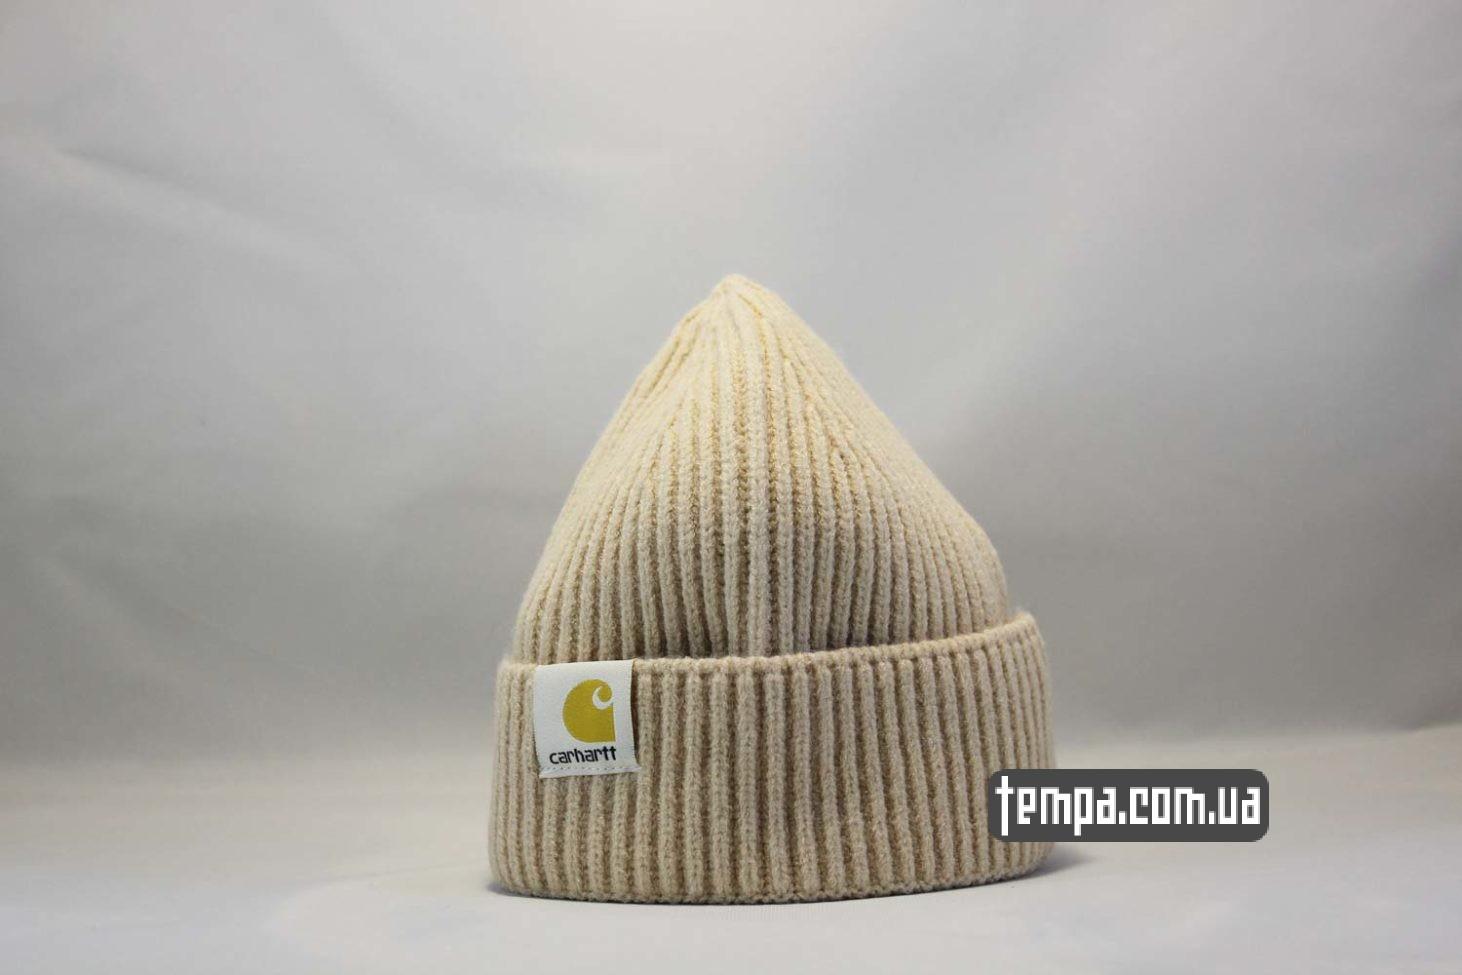 каороткая шапка beanie Carhartt бежевая купить Украина